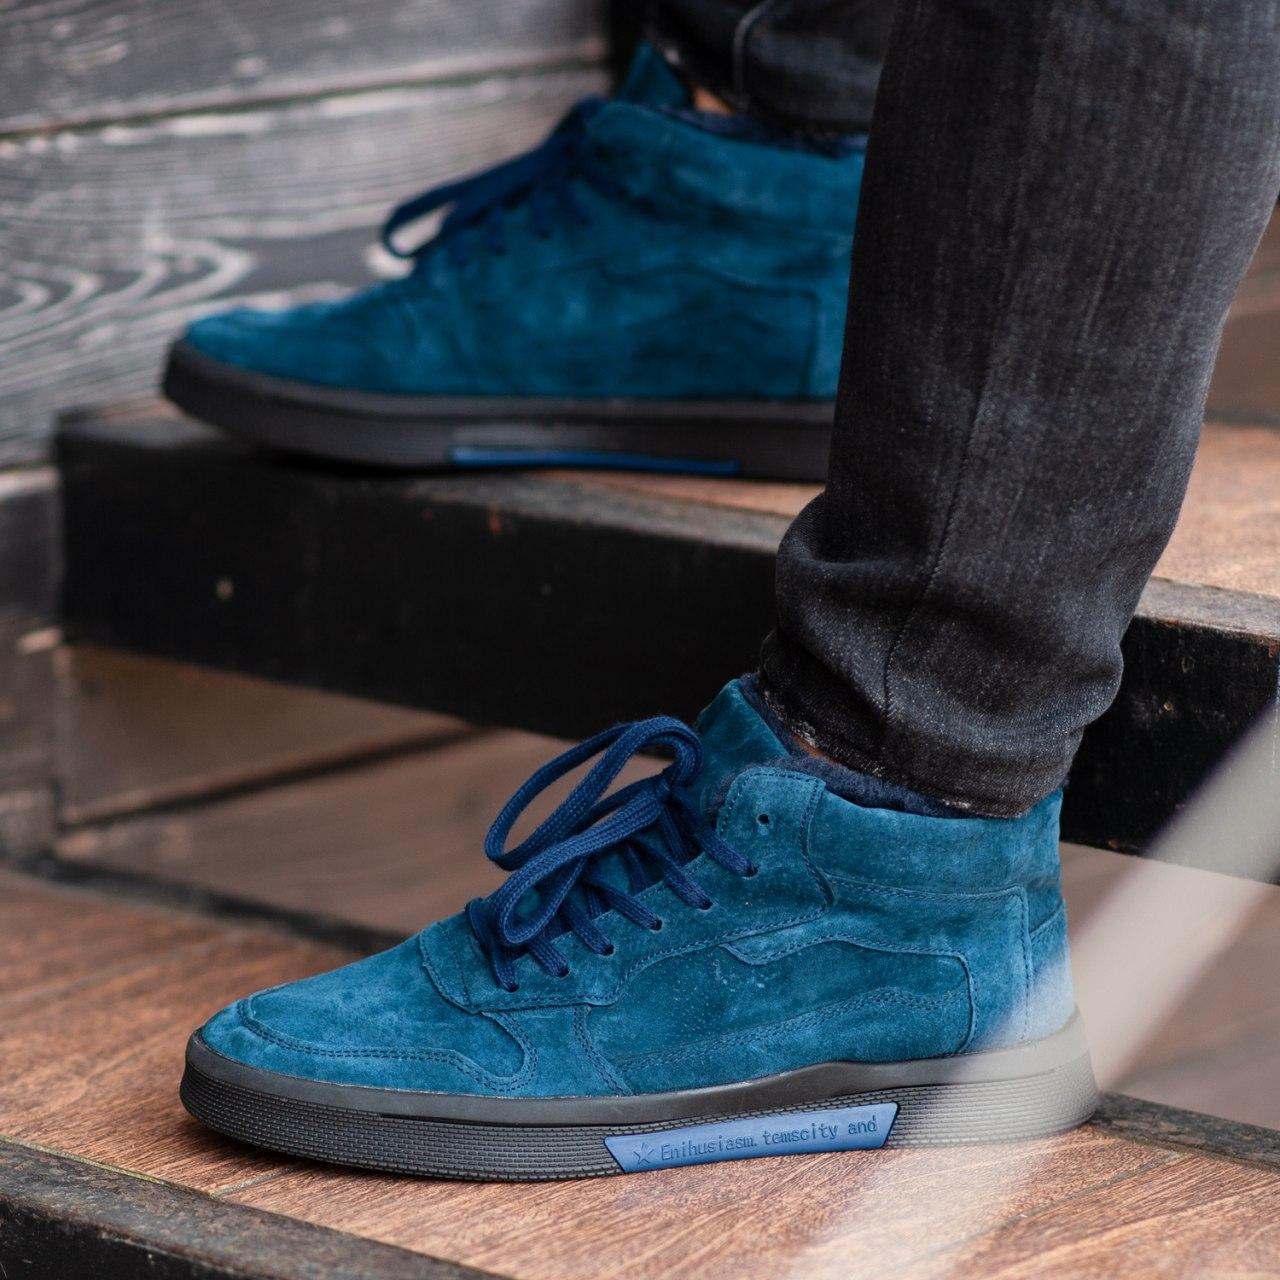 Ботинки South Oriole blue - фото 1